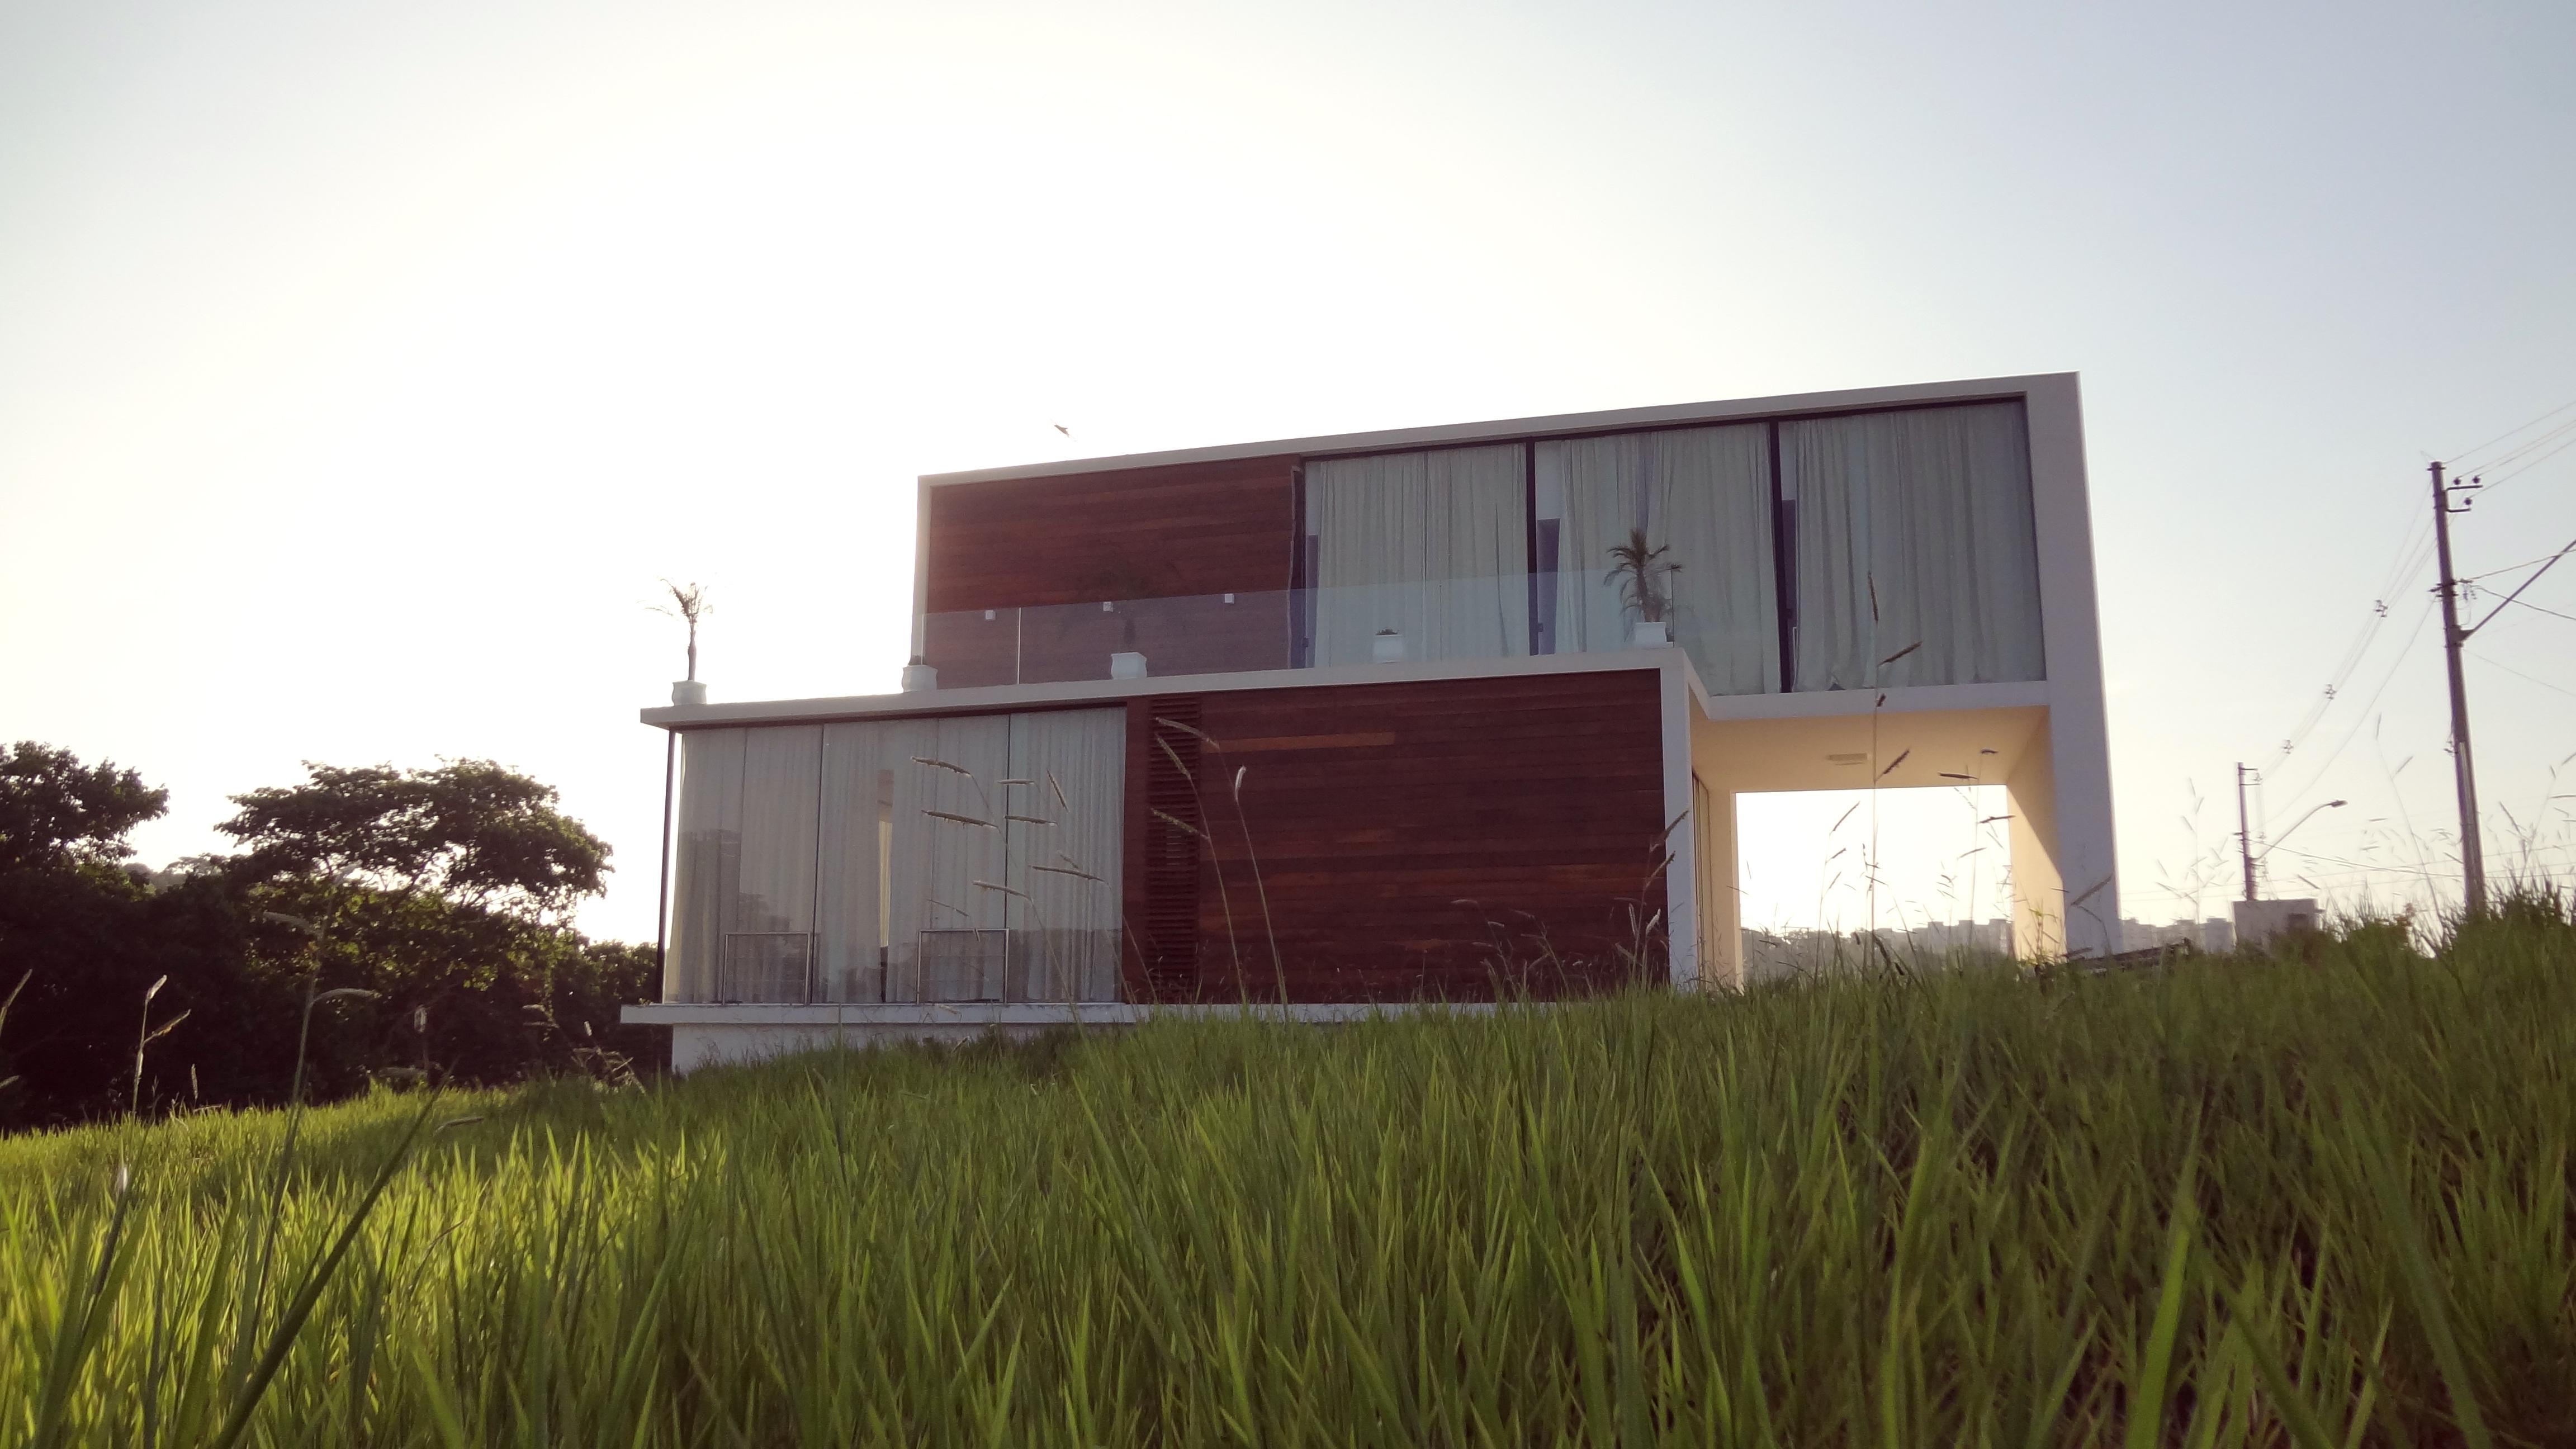 Casa Bromélia / Urban Recycle Architecture.Studio, © Urban Media